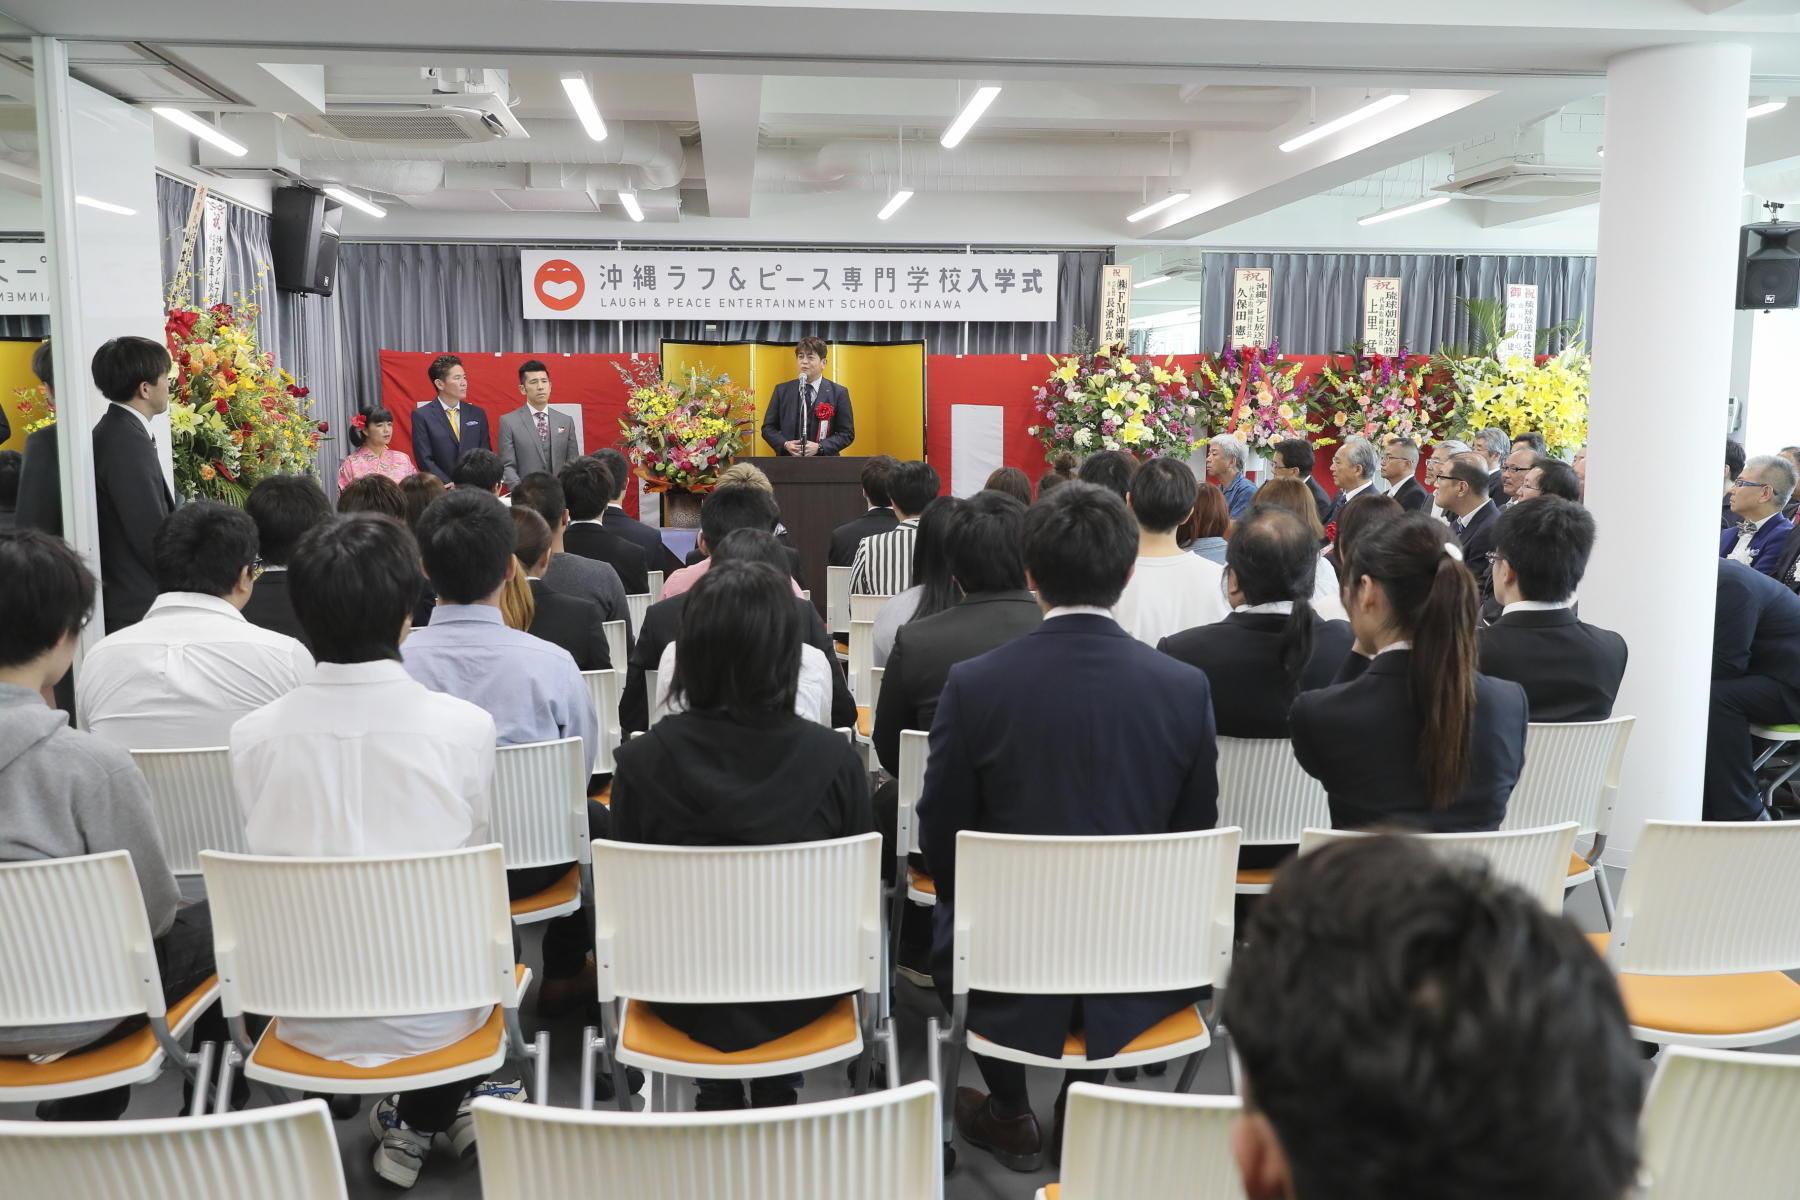 http://news.yoshimoto.co.jp/20180409185624-f44bbea9ec531e61cc90925fc17a199da4823dcc.jpg